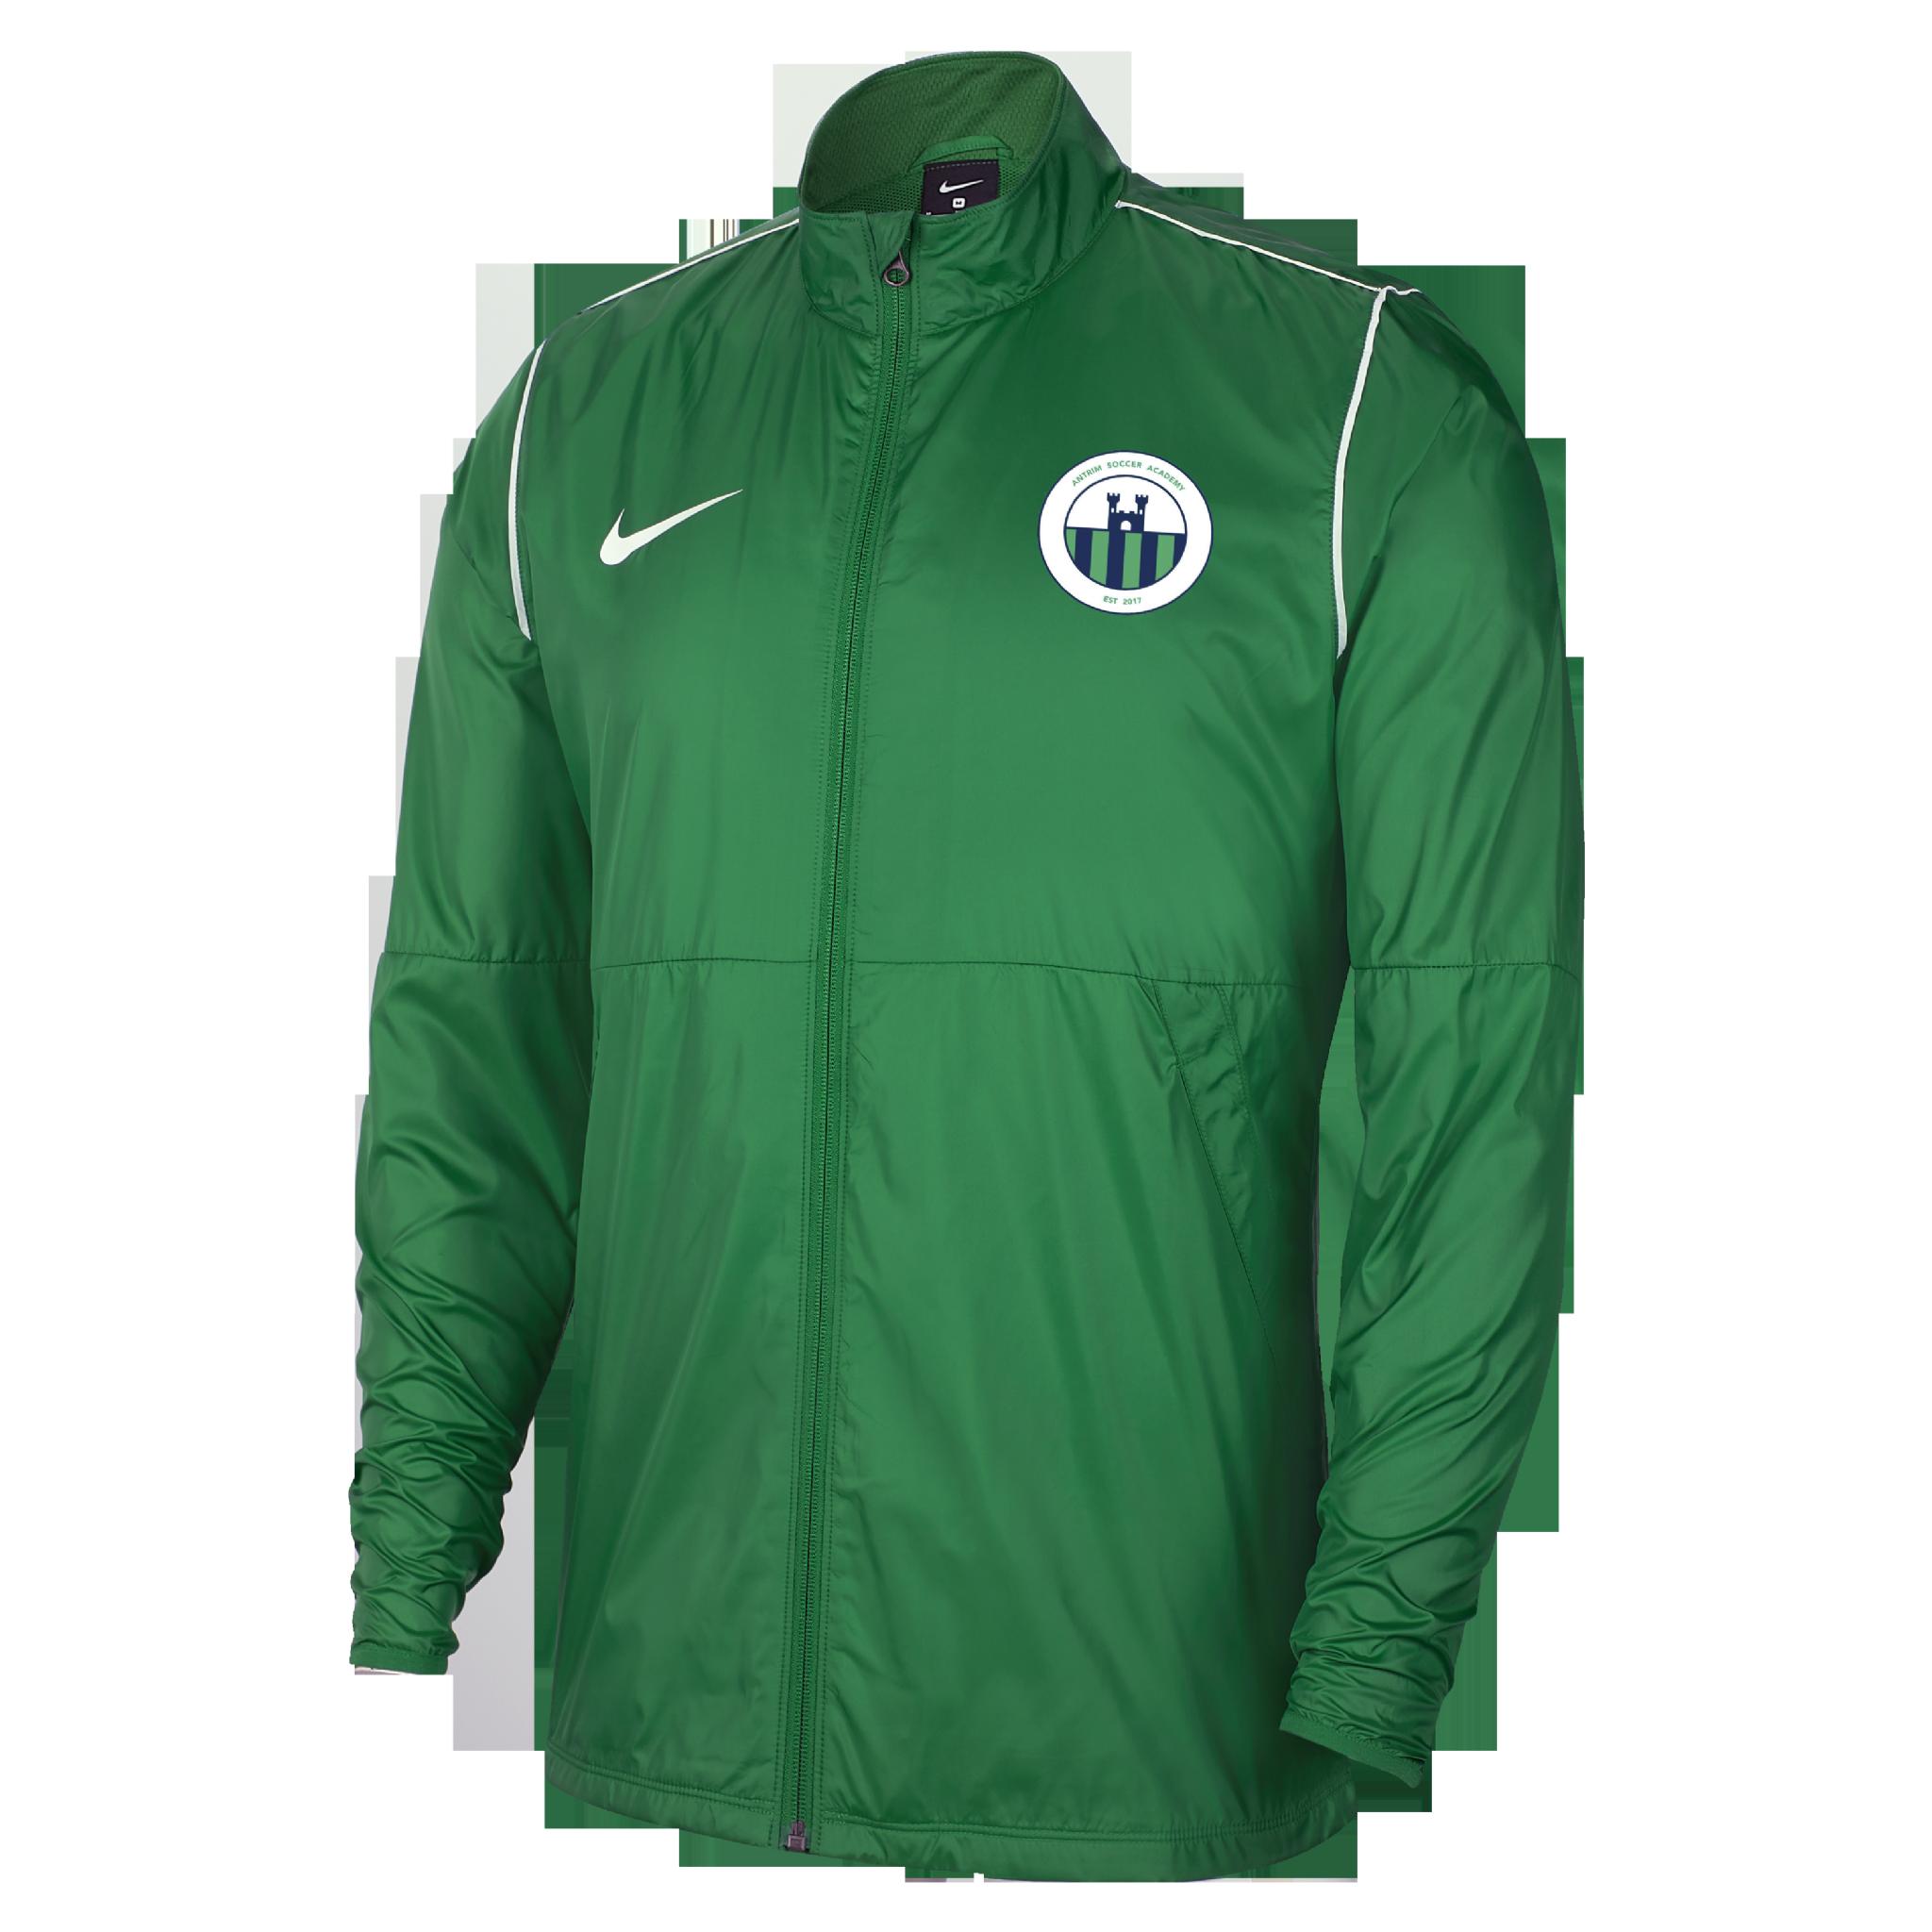 antrim soccer academy park 20 rain jacket size xs 38144 p